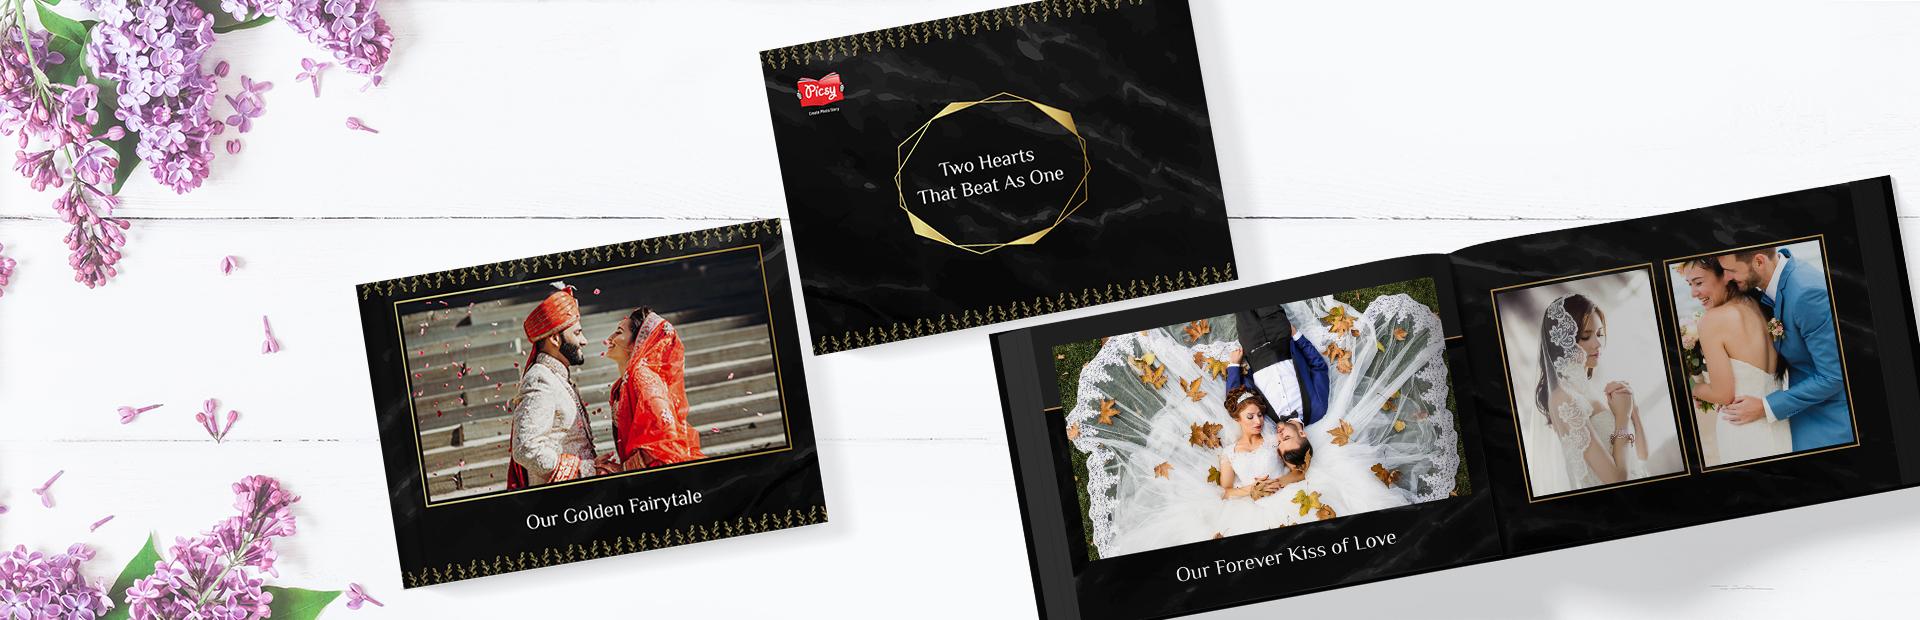 Wedding World Photo Book Printing